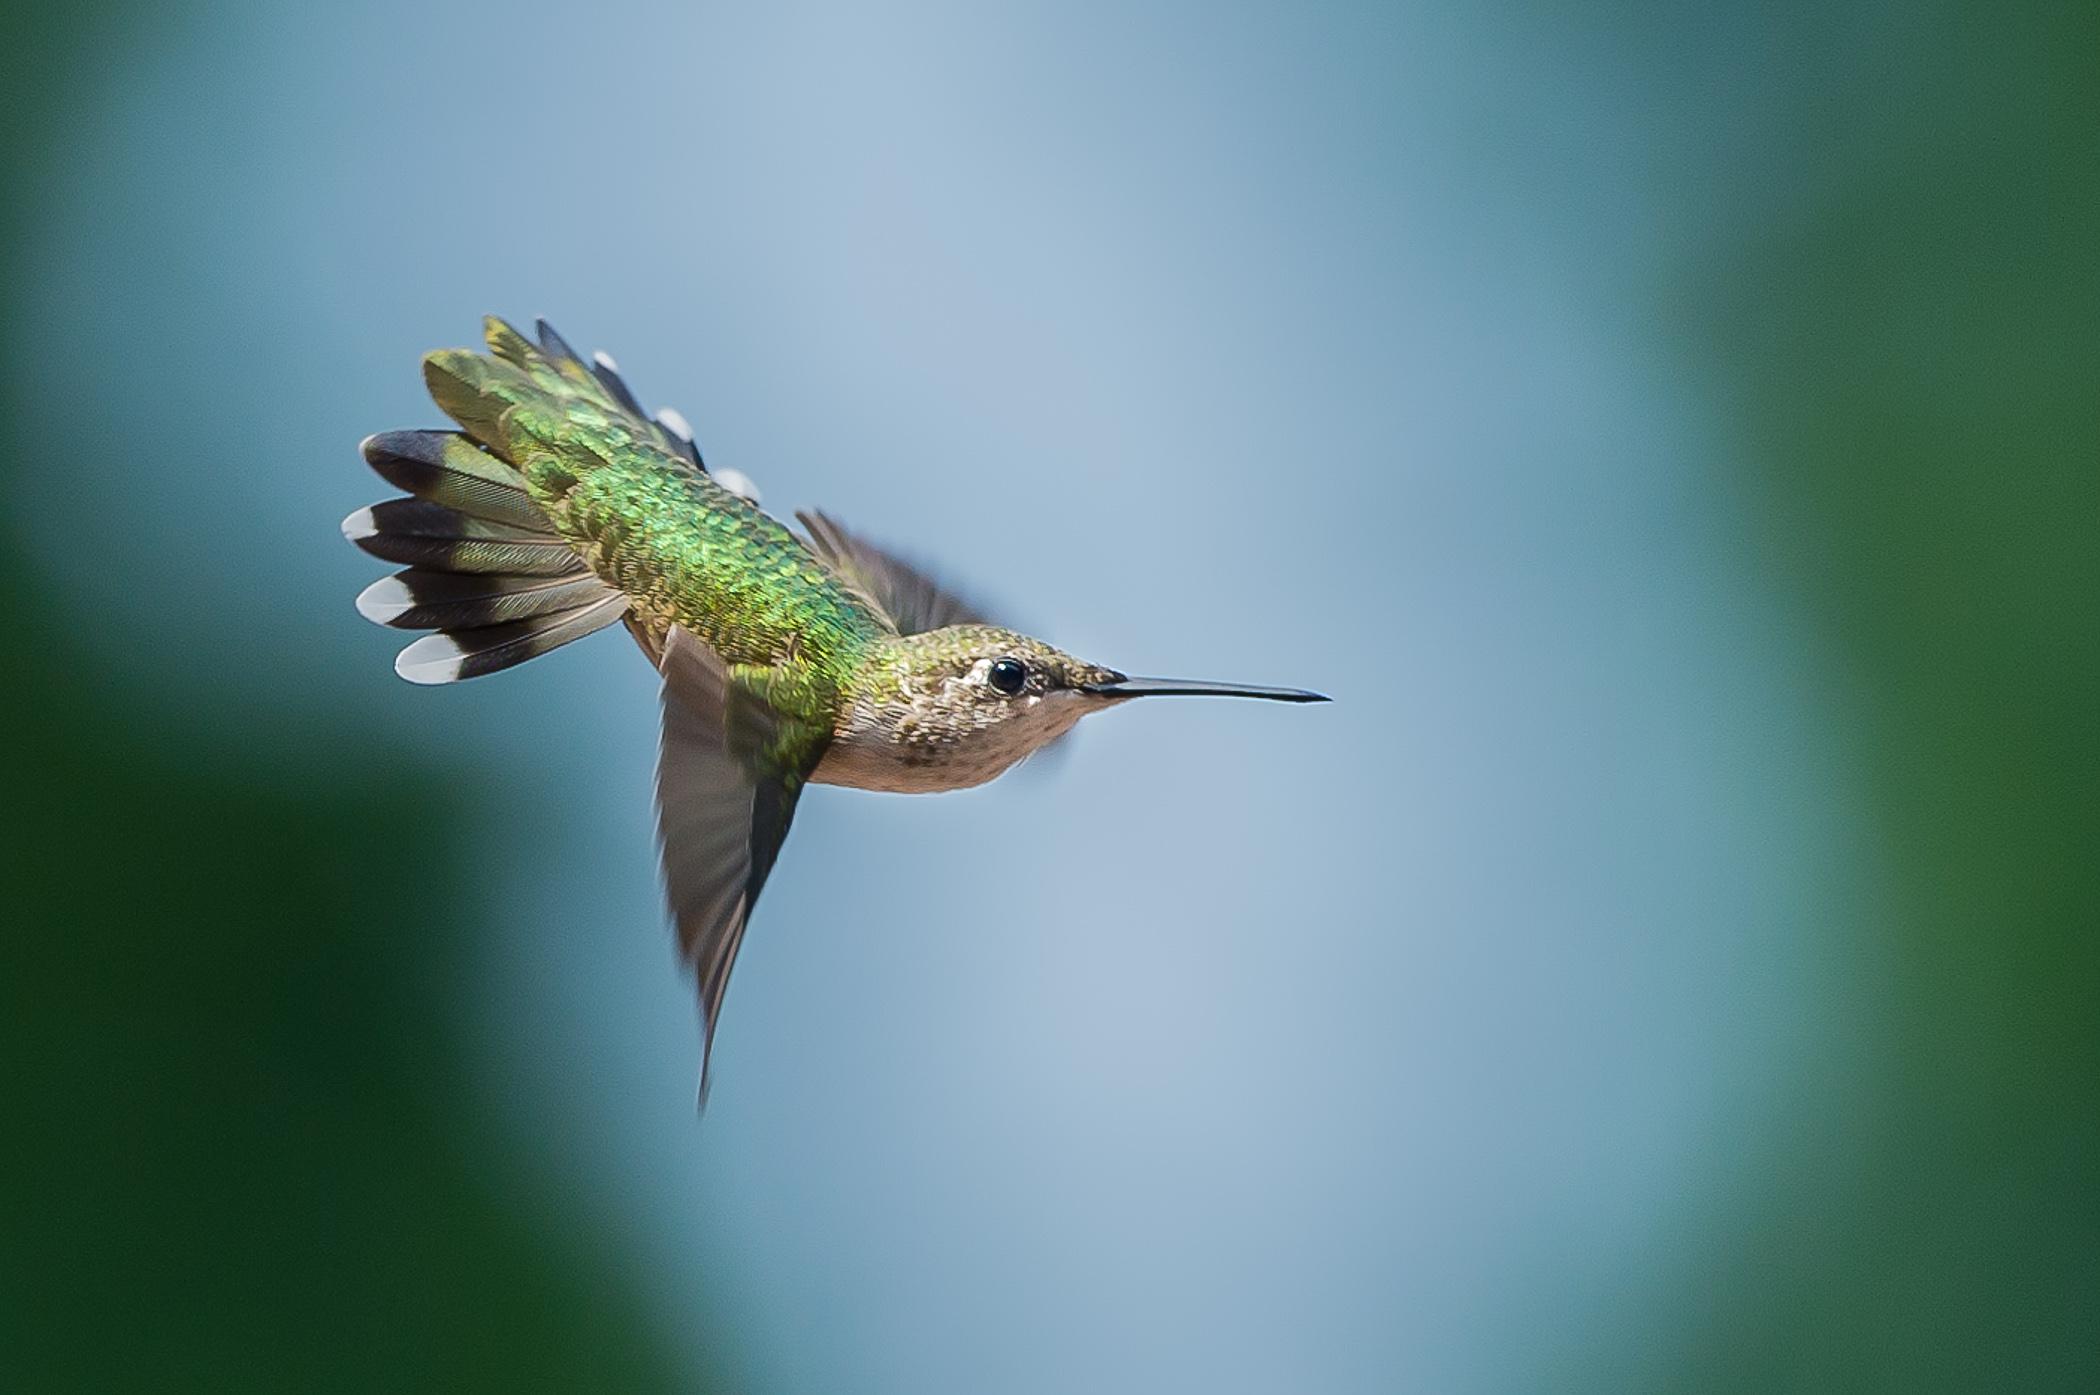 2014-08-05_Hummingbirds_Booker_0034-Edit-Edit.jpg